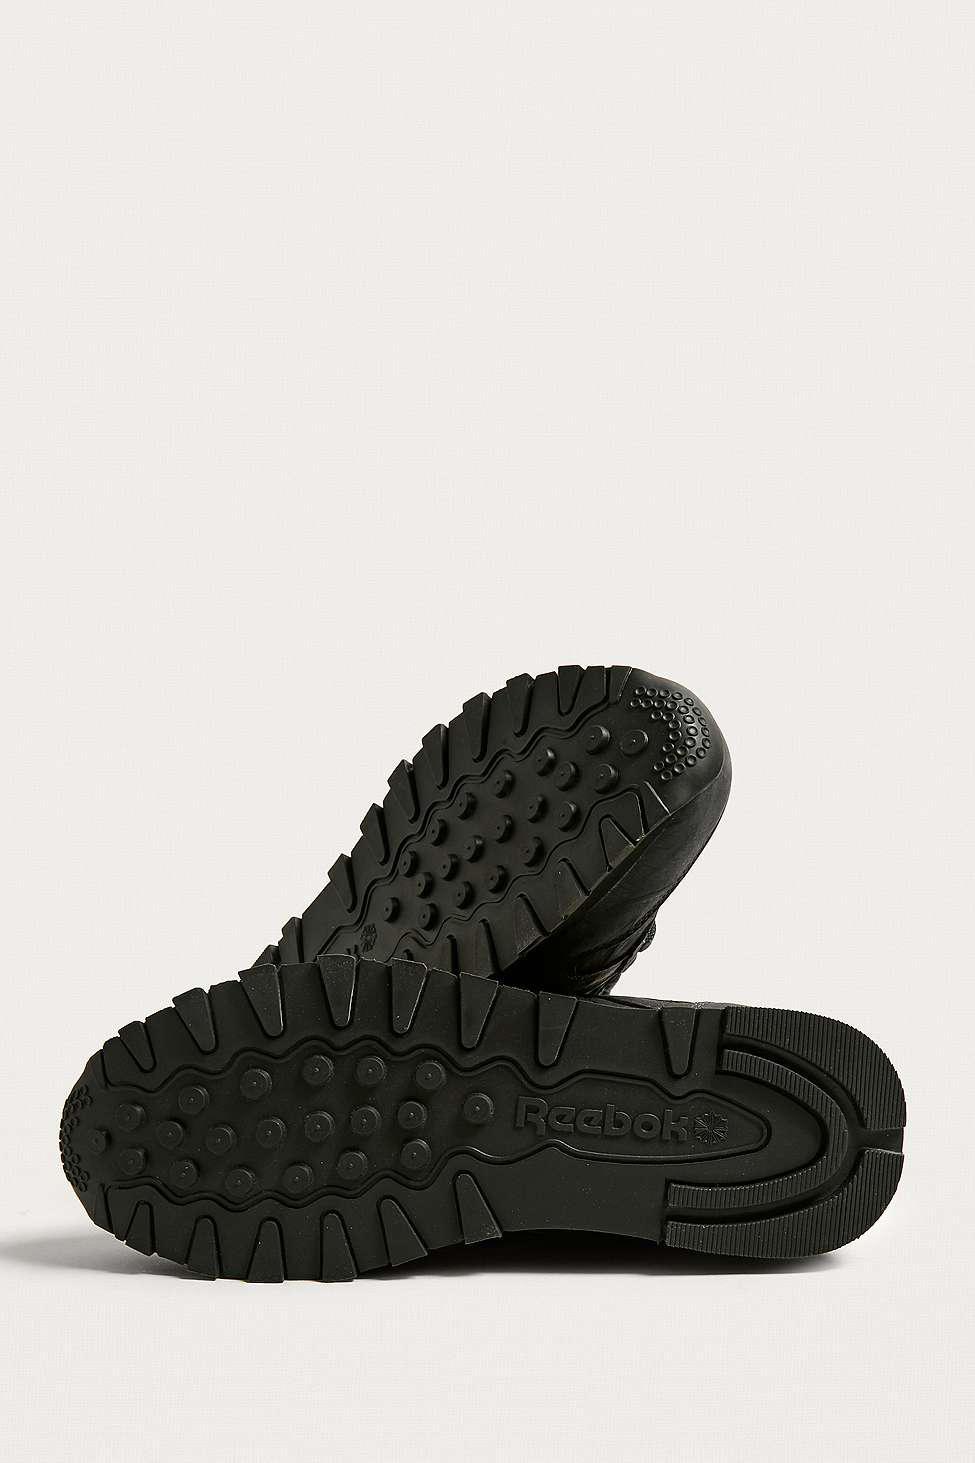 10e21d01093 Reebok Classic Leather Tu Black Trainers - Mens Uk 11 in Metallic ...